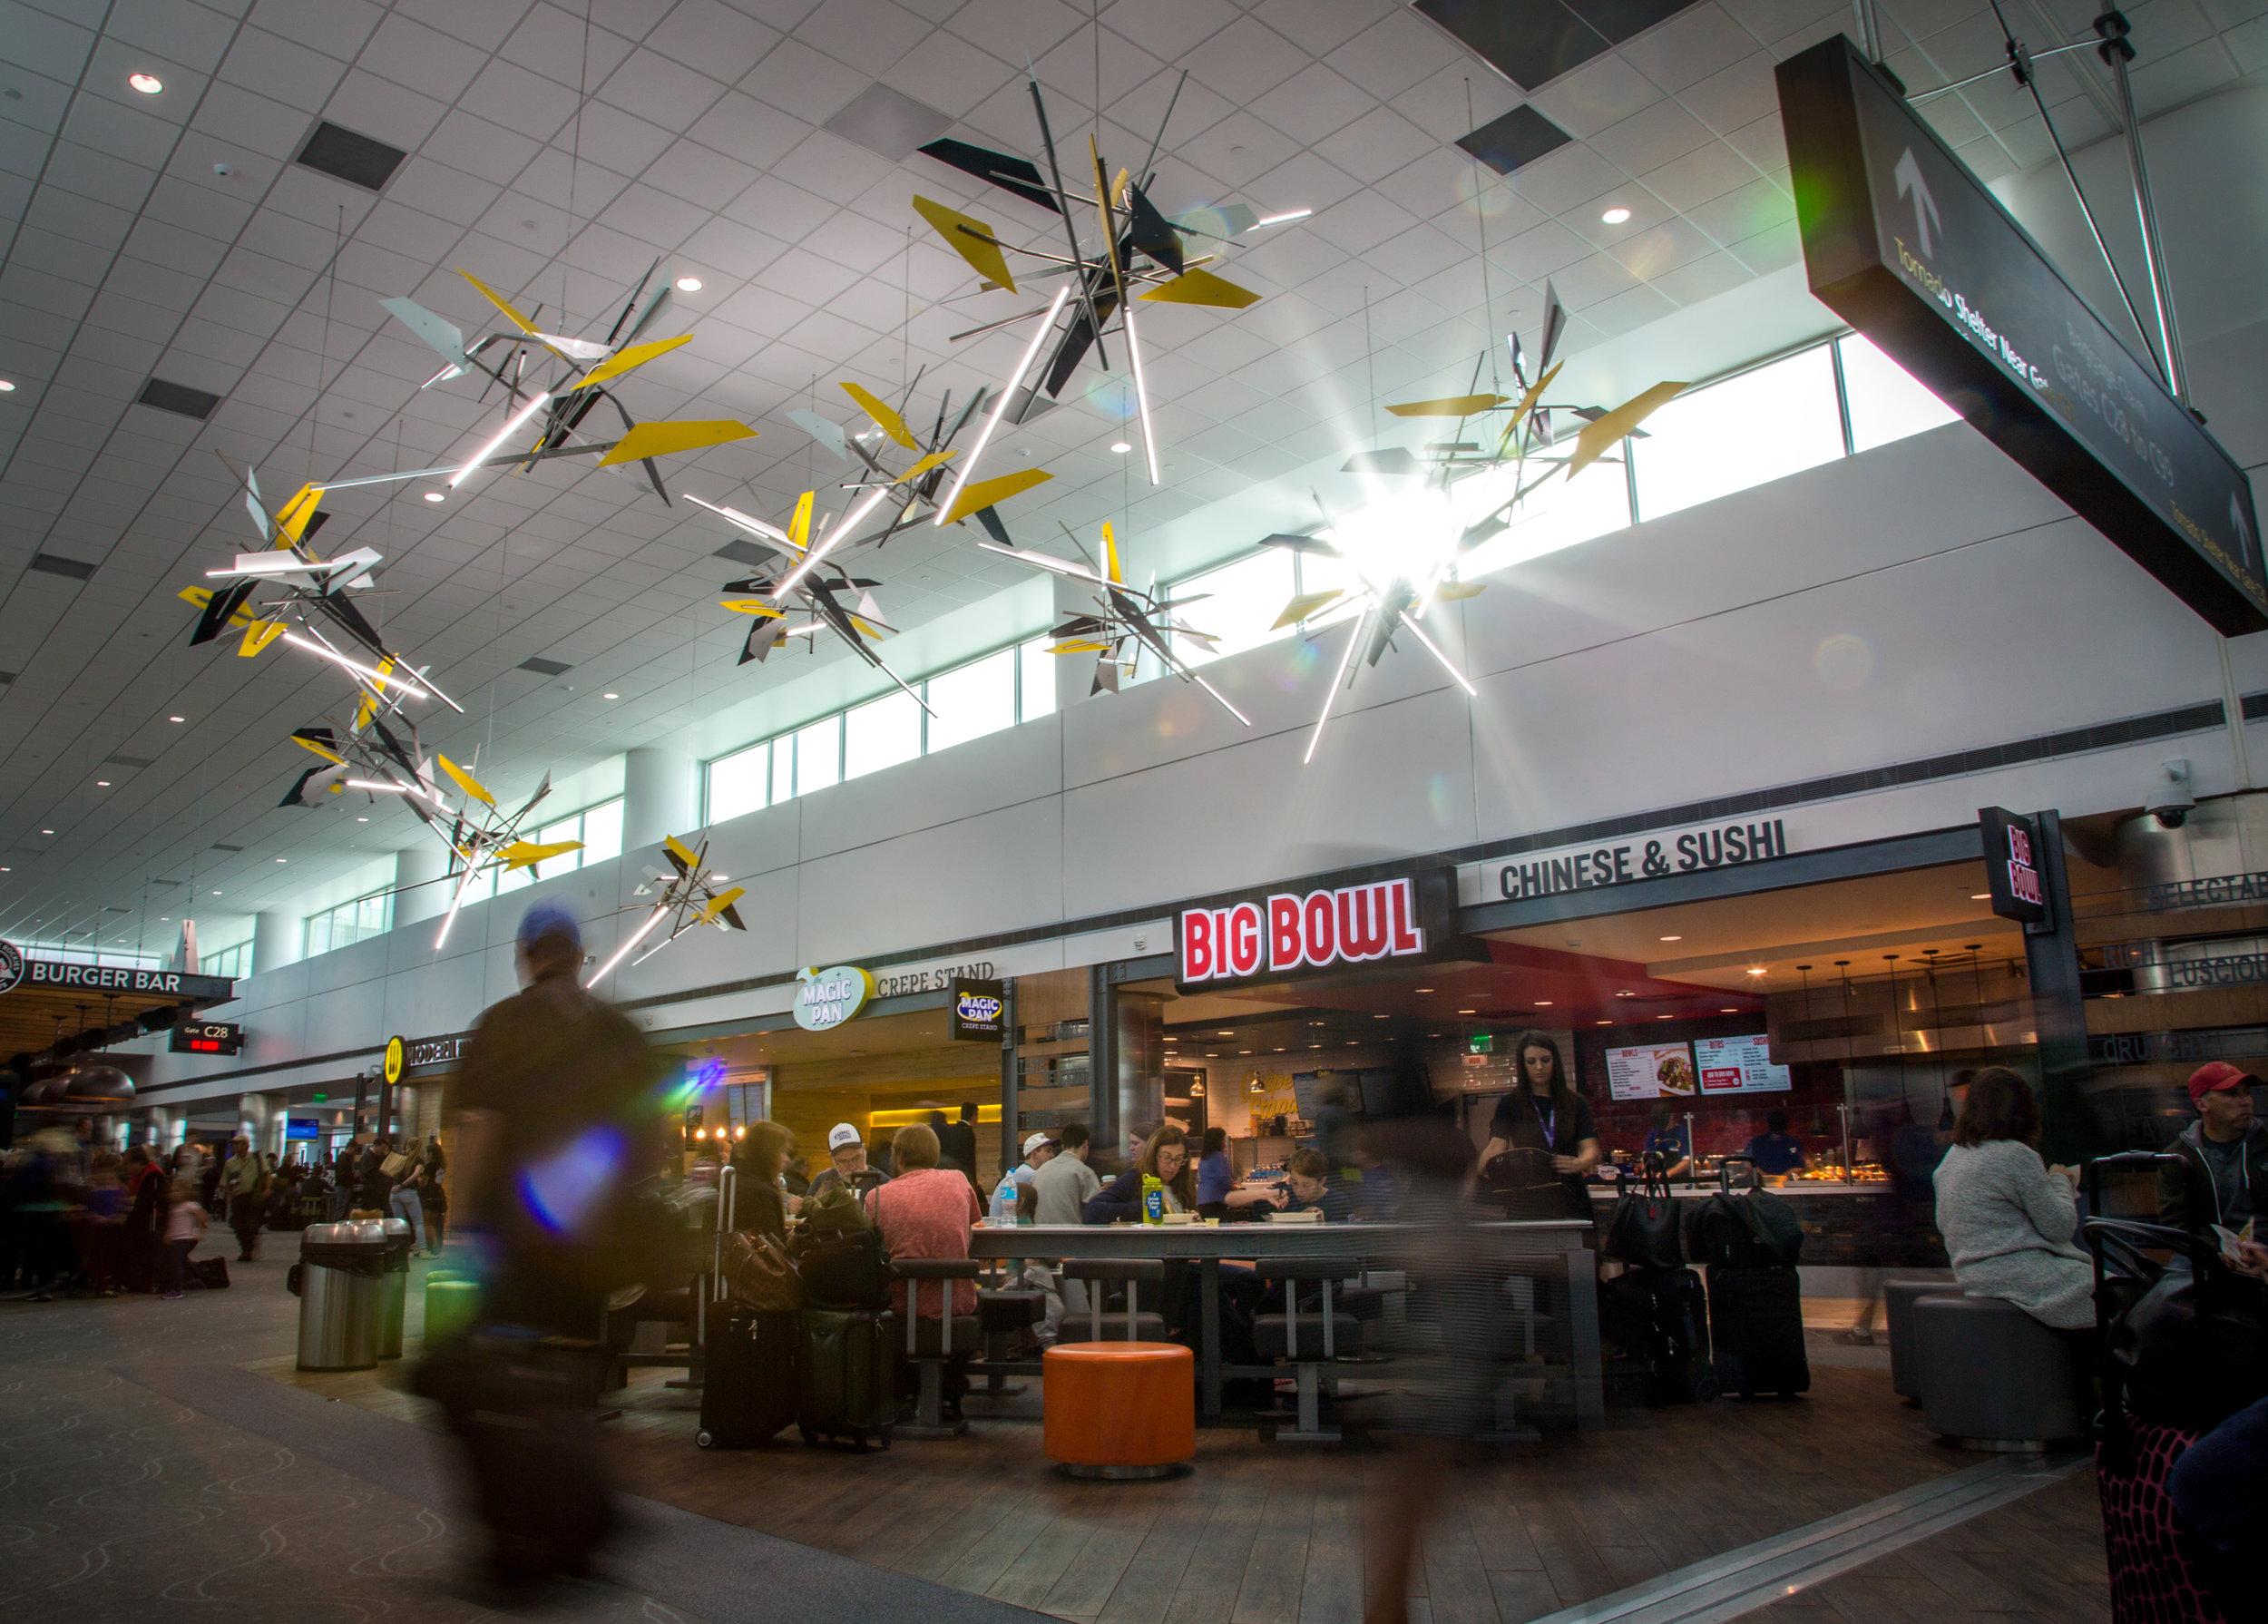 Photograph provided courtesy of Denver International Airport